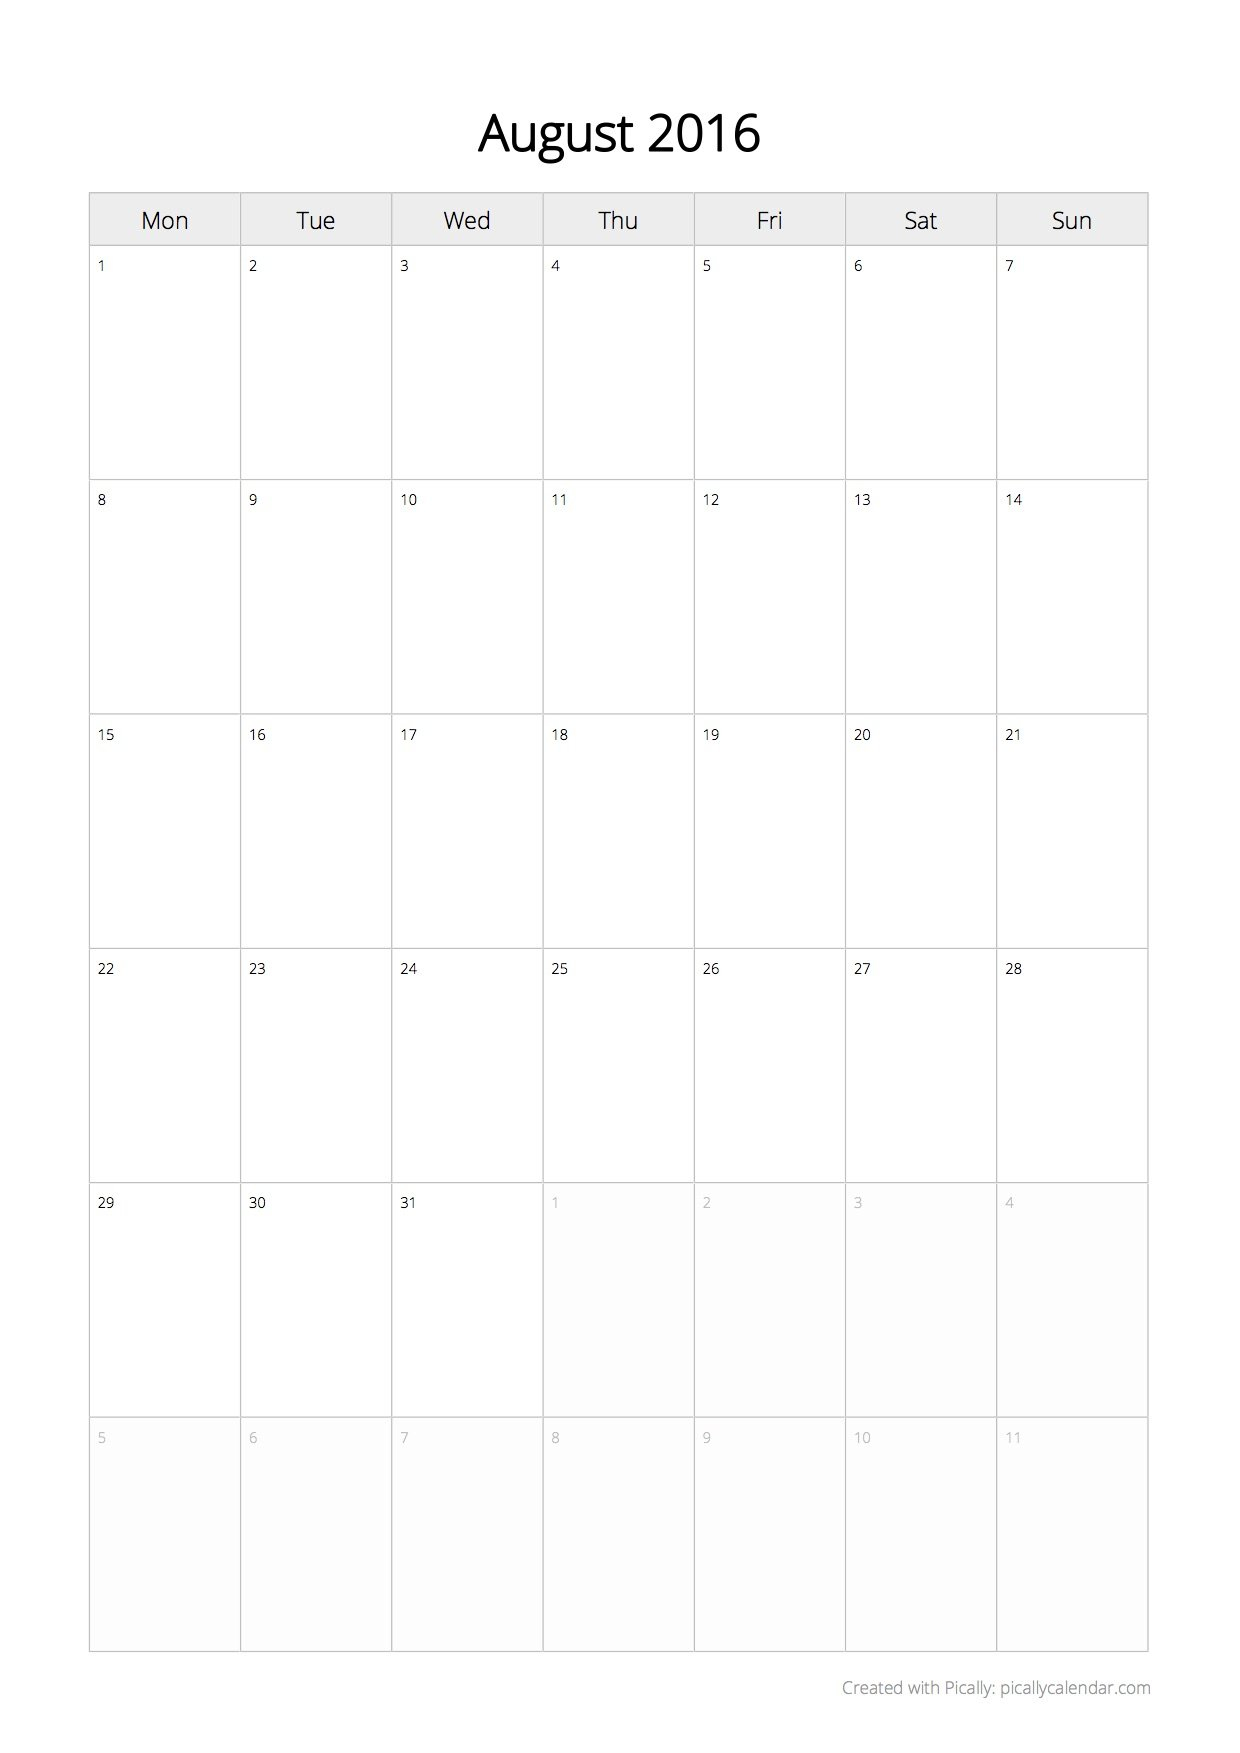 Create Free Photo Calendar 2019 And 2020 - Picallycalendar Calendar 2019 Create